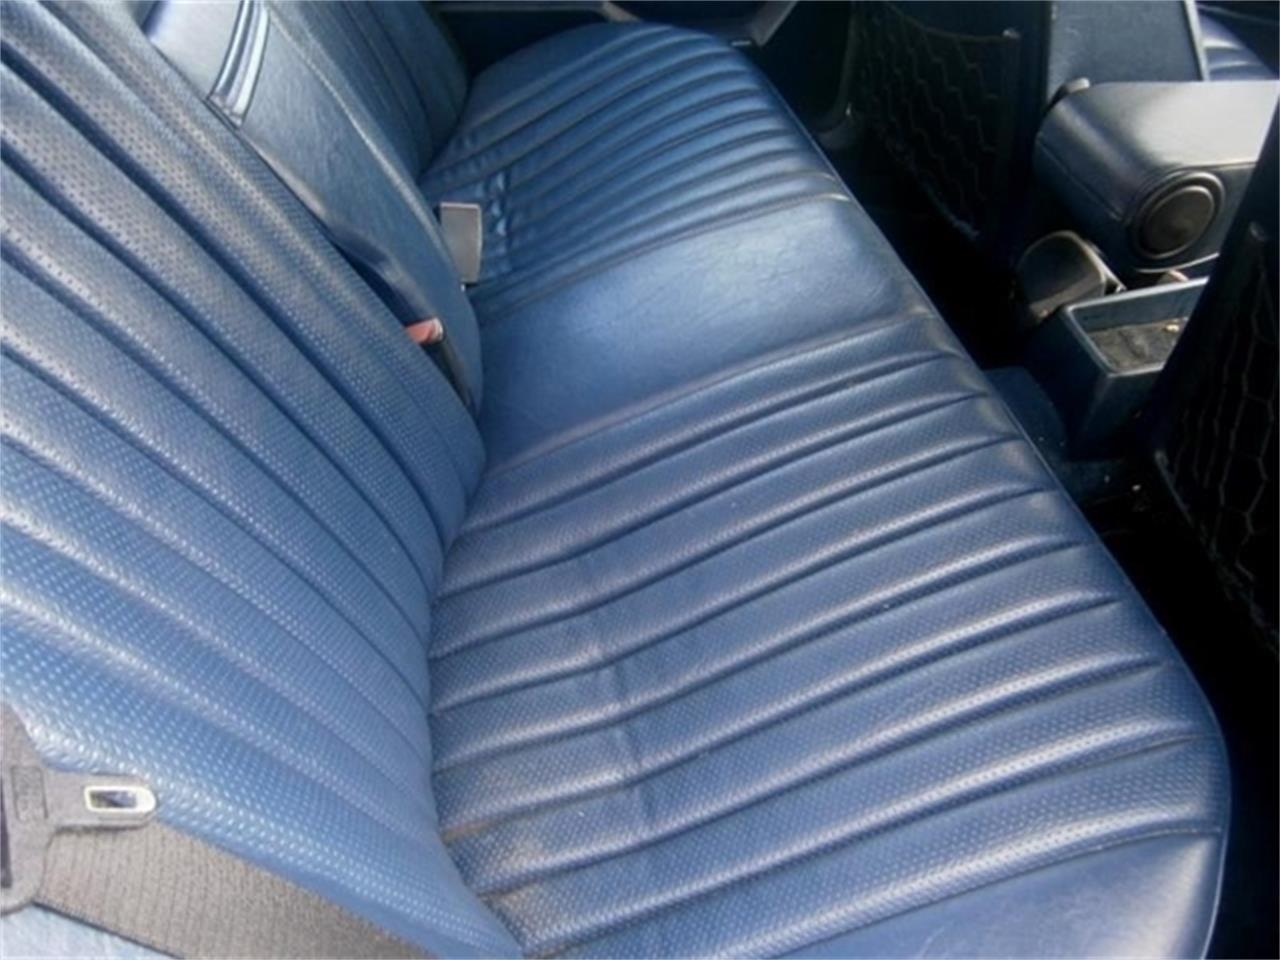 1986 Mercedes-Benz 300 for sale in Bedford, VA ...